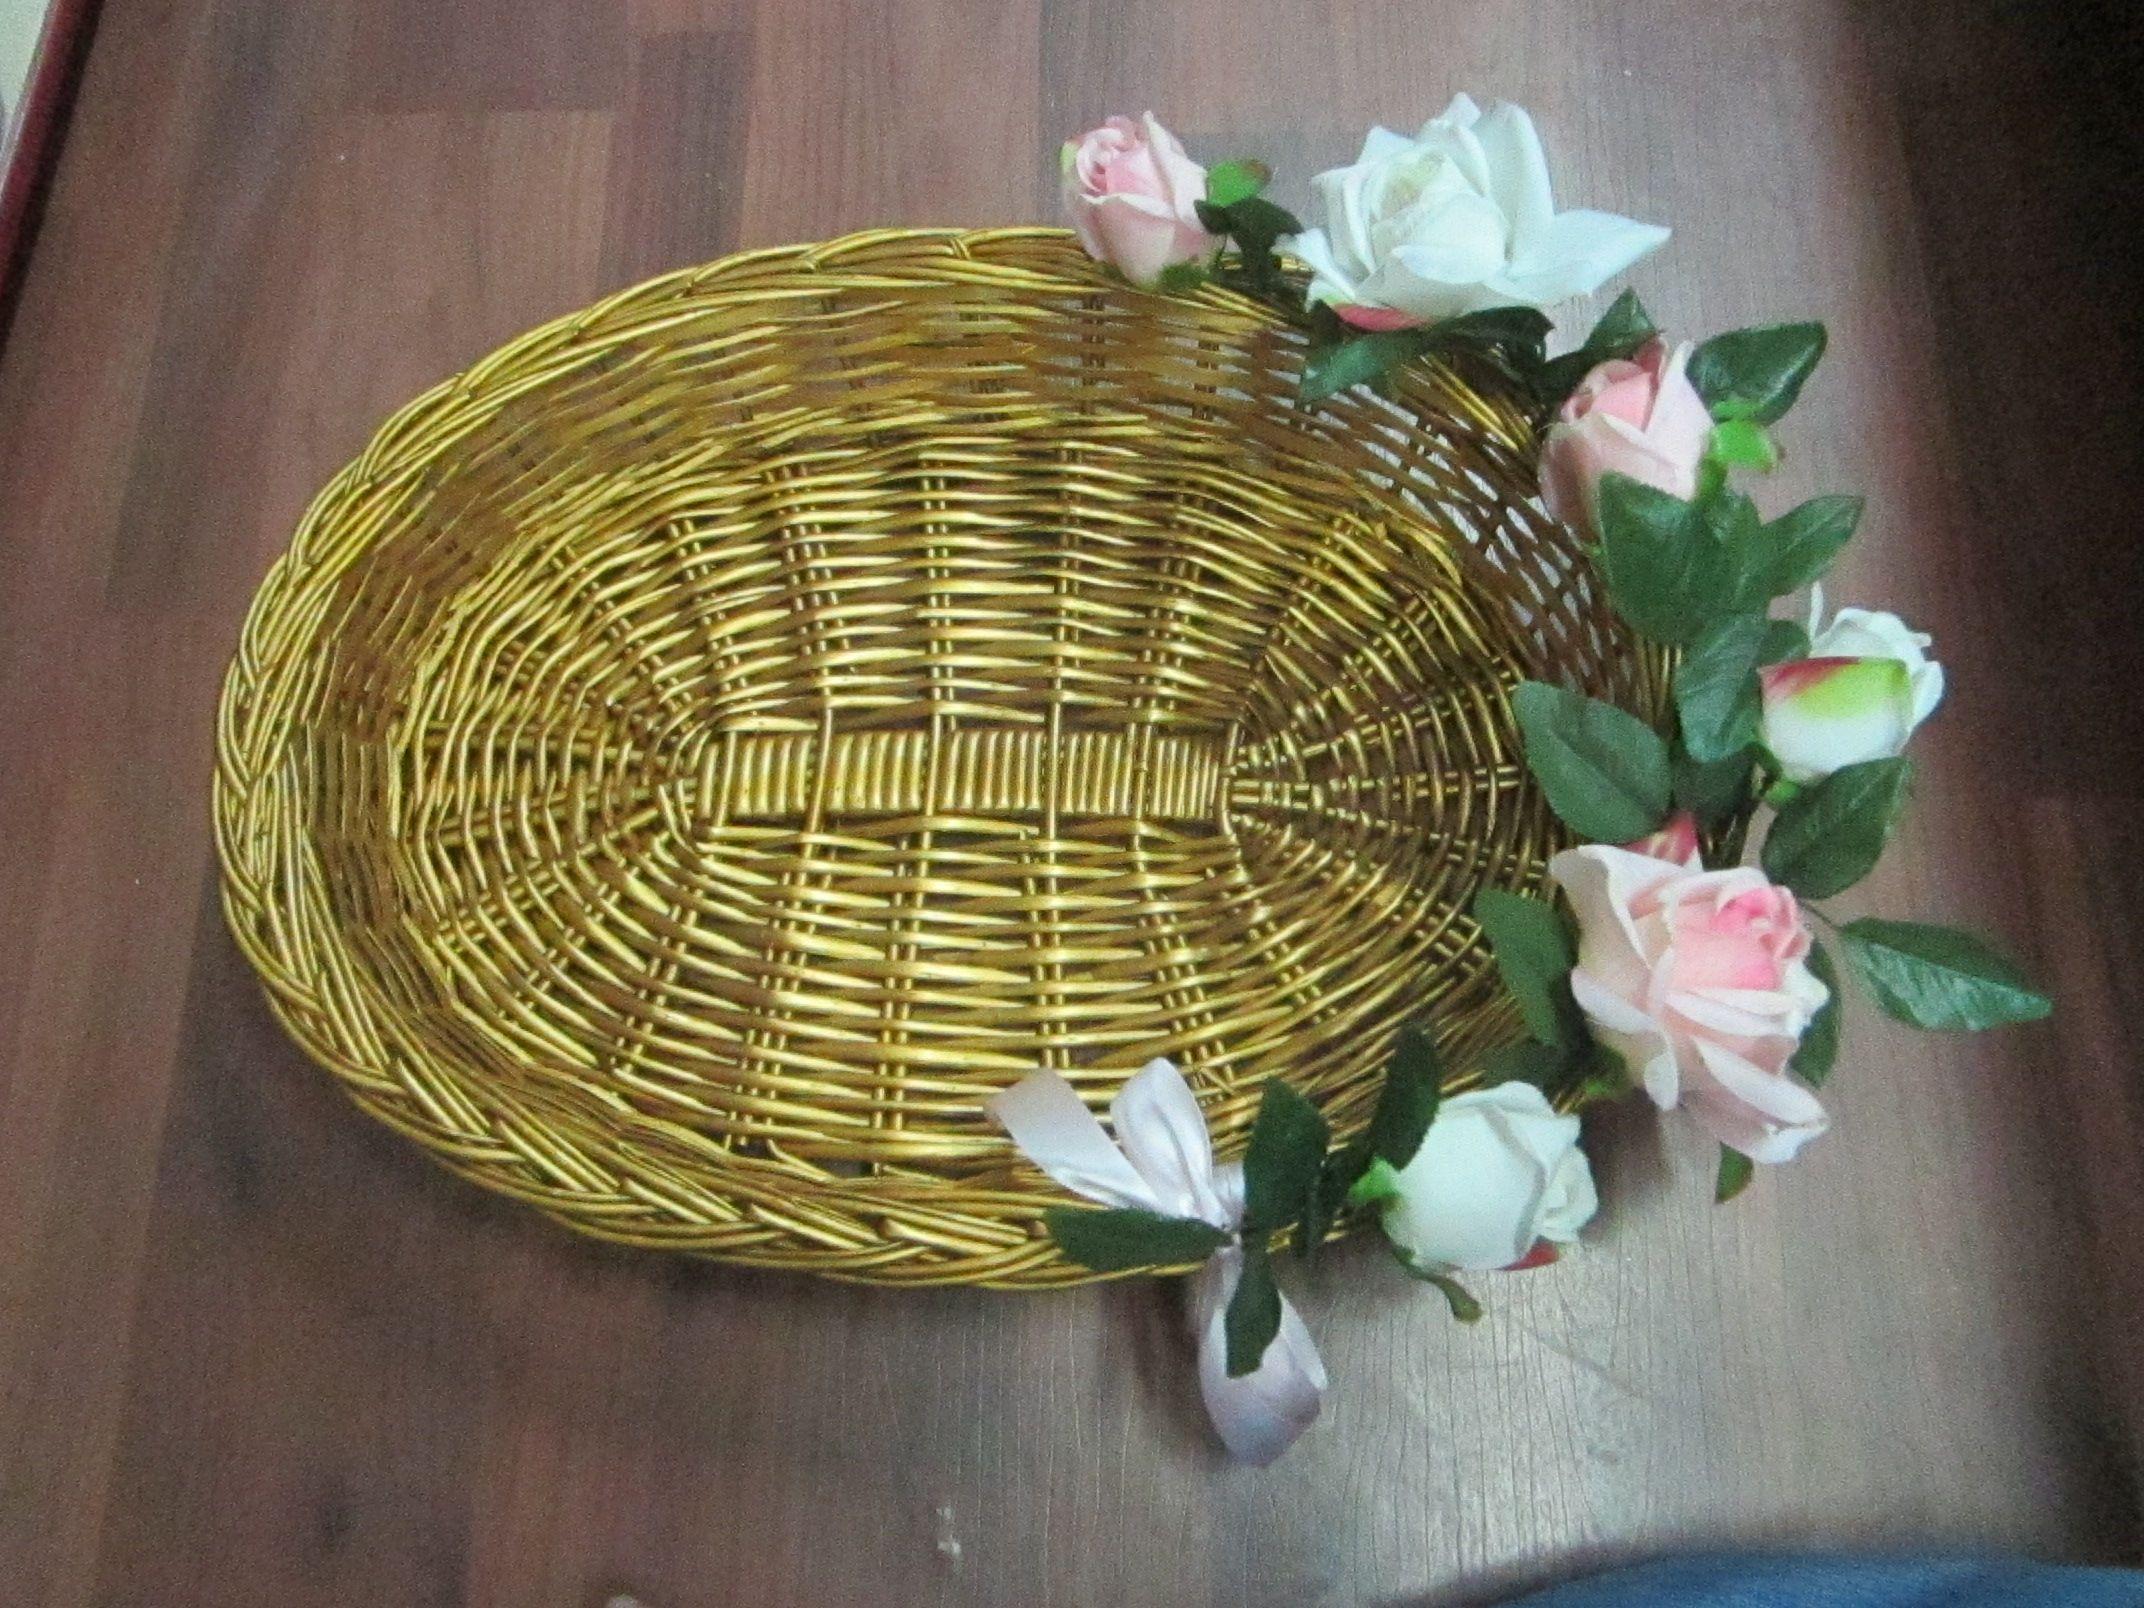 Cane Basket With Flowers Decorations Cane Baskets Basket